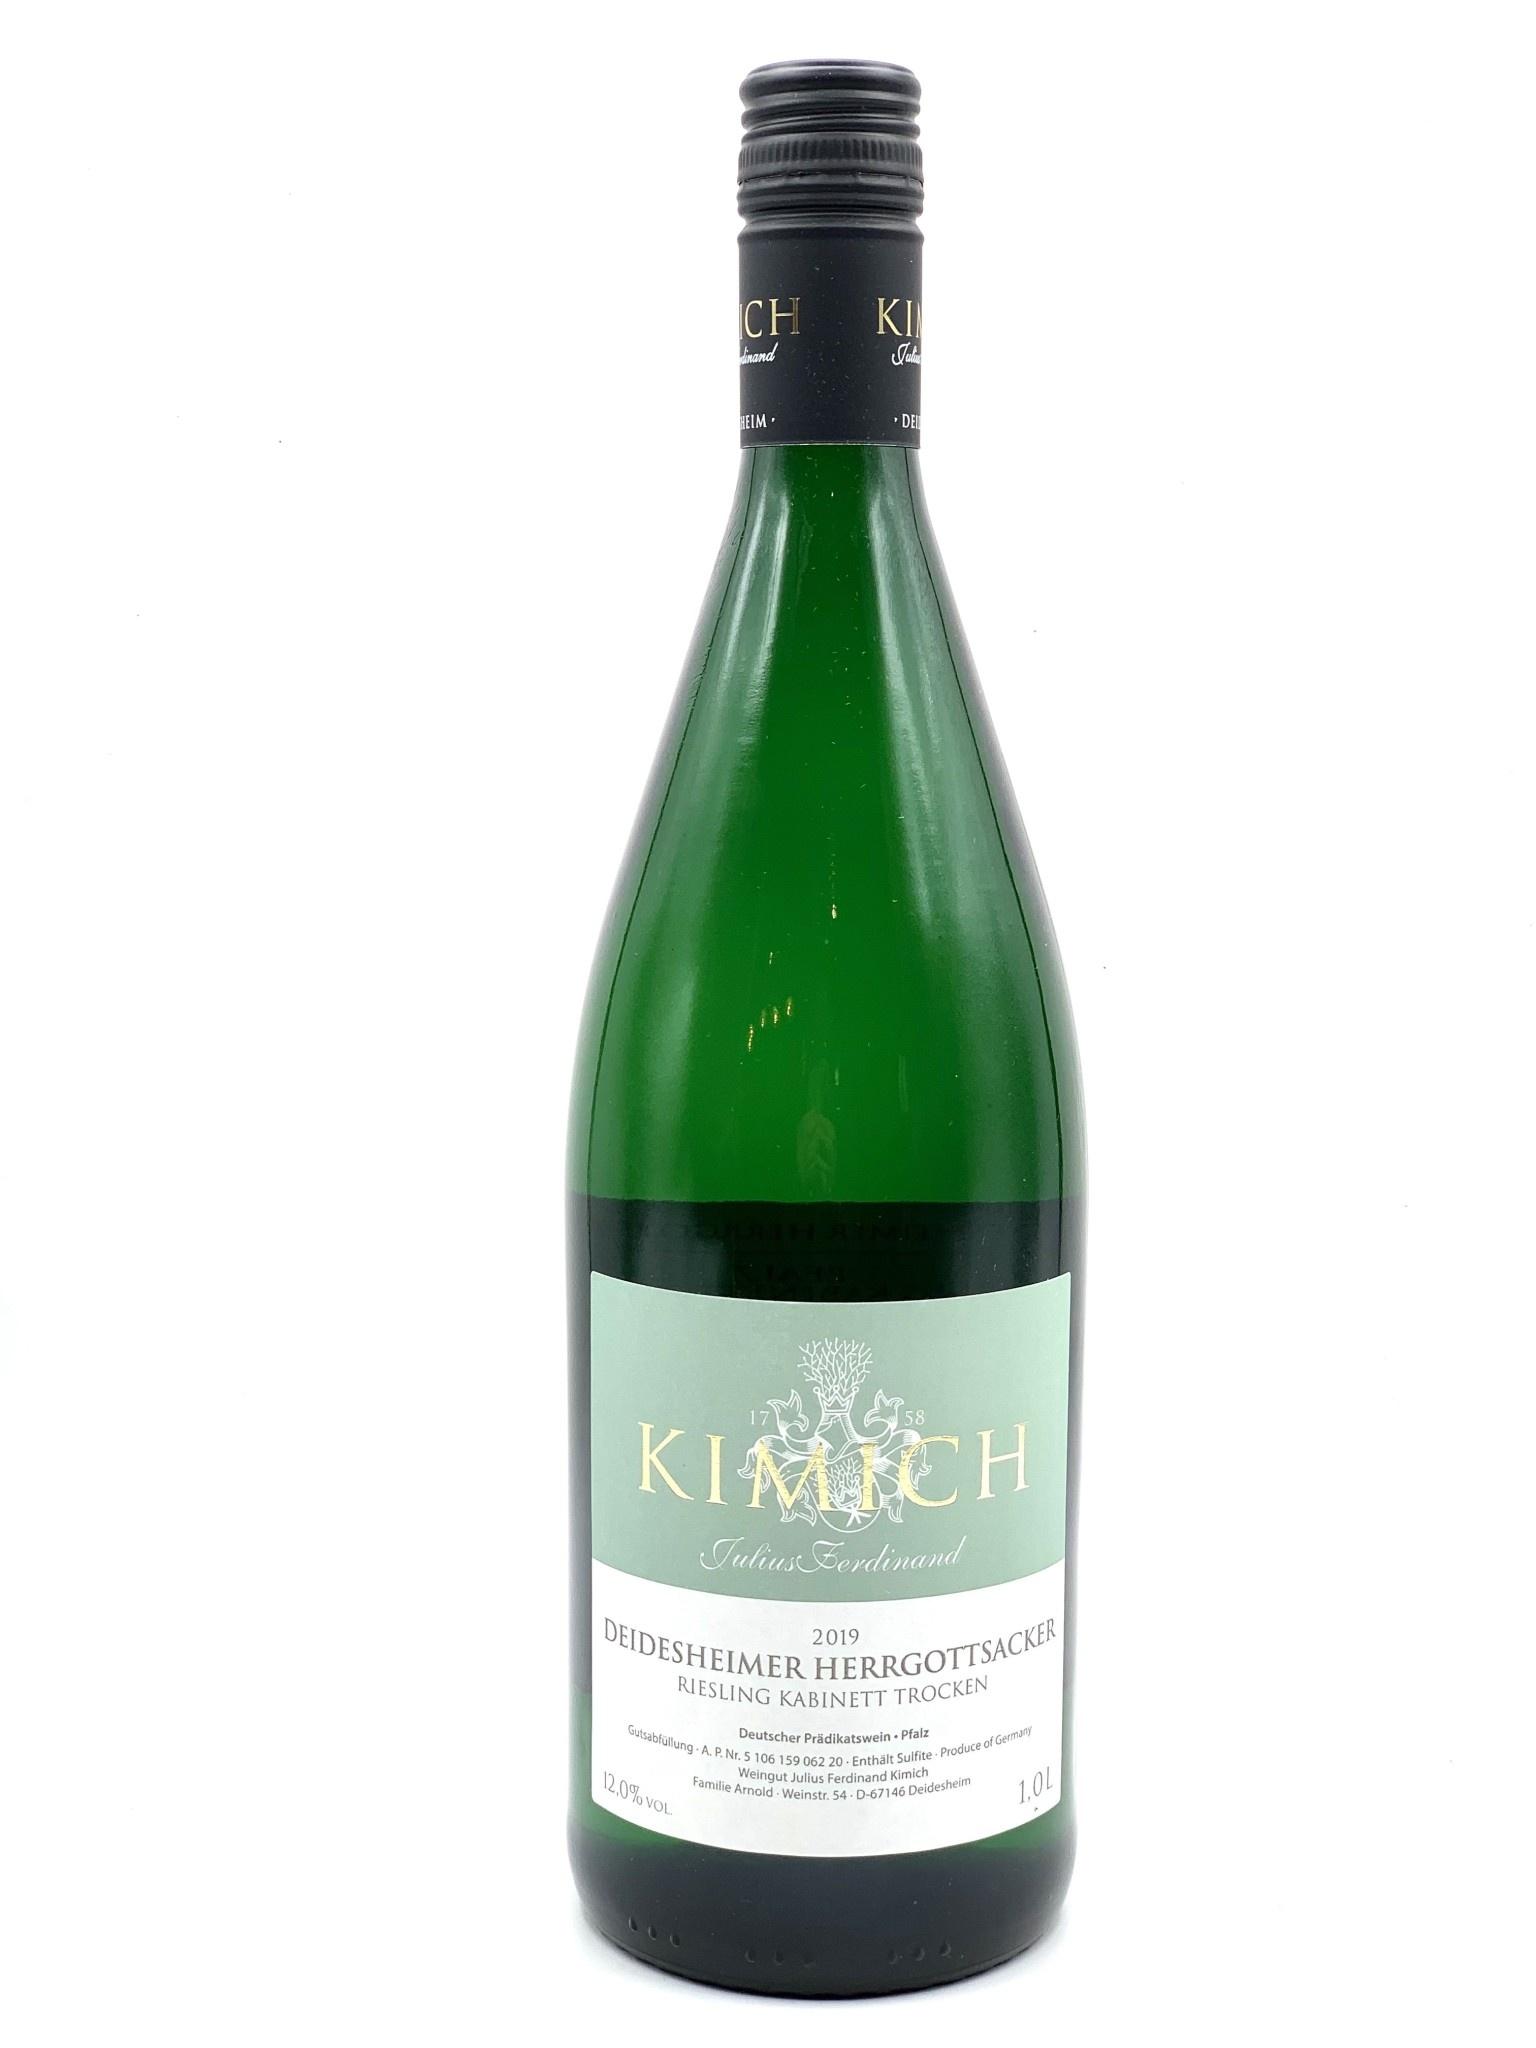 Pfalz Deidesheimer Riesling 2019 Kimich Herrgottsacker Kabinet Trocken  1.0L